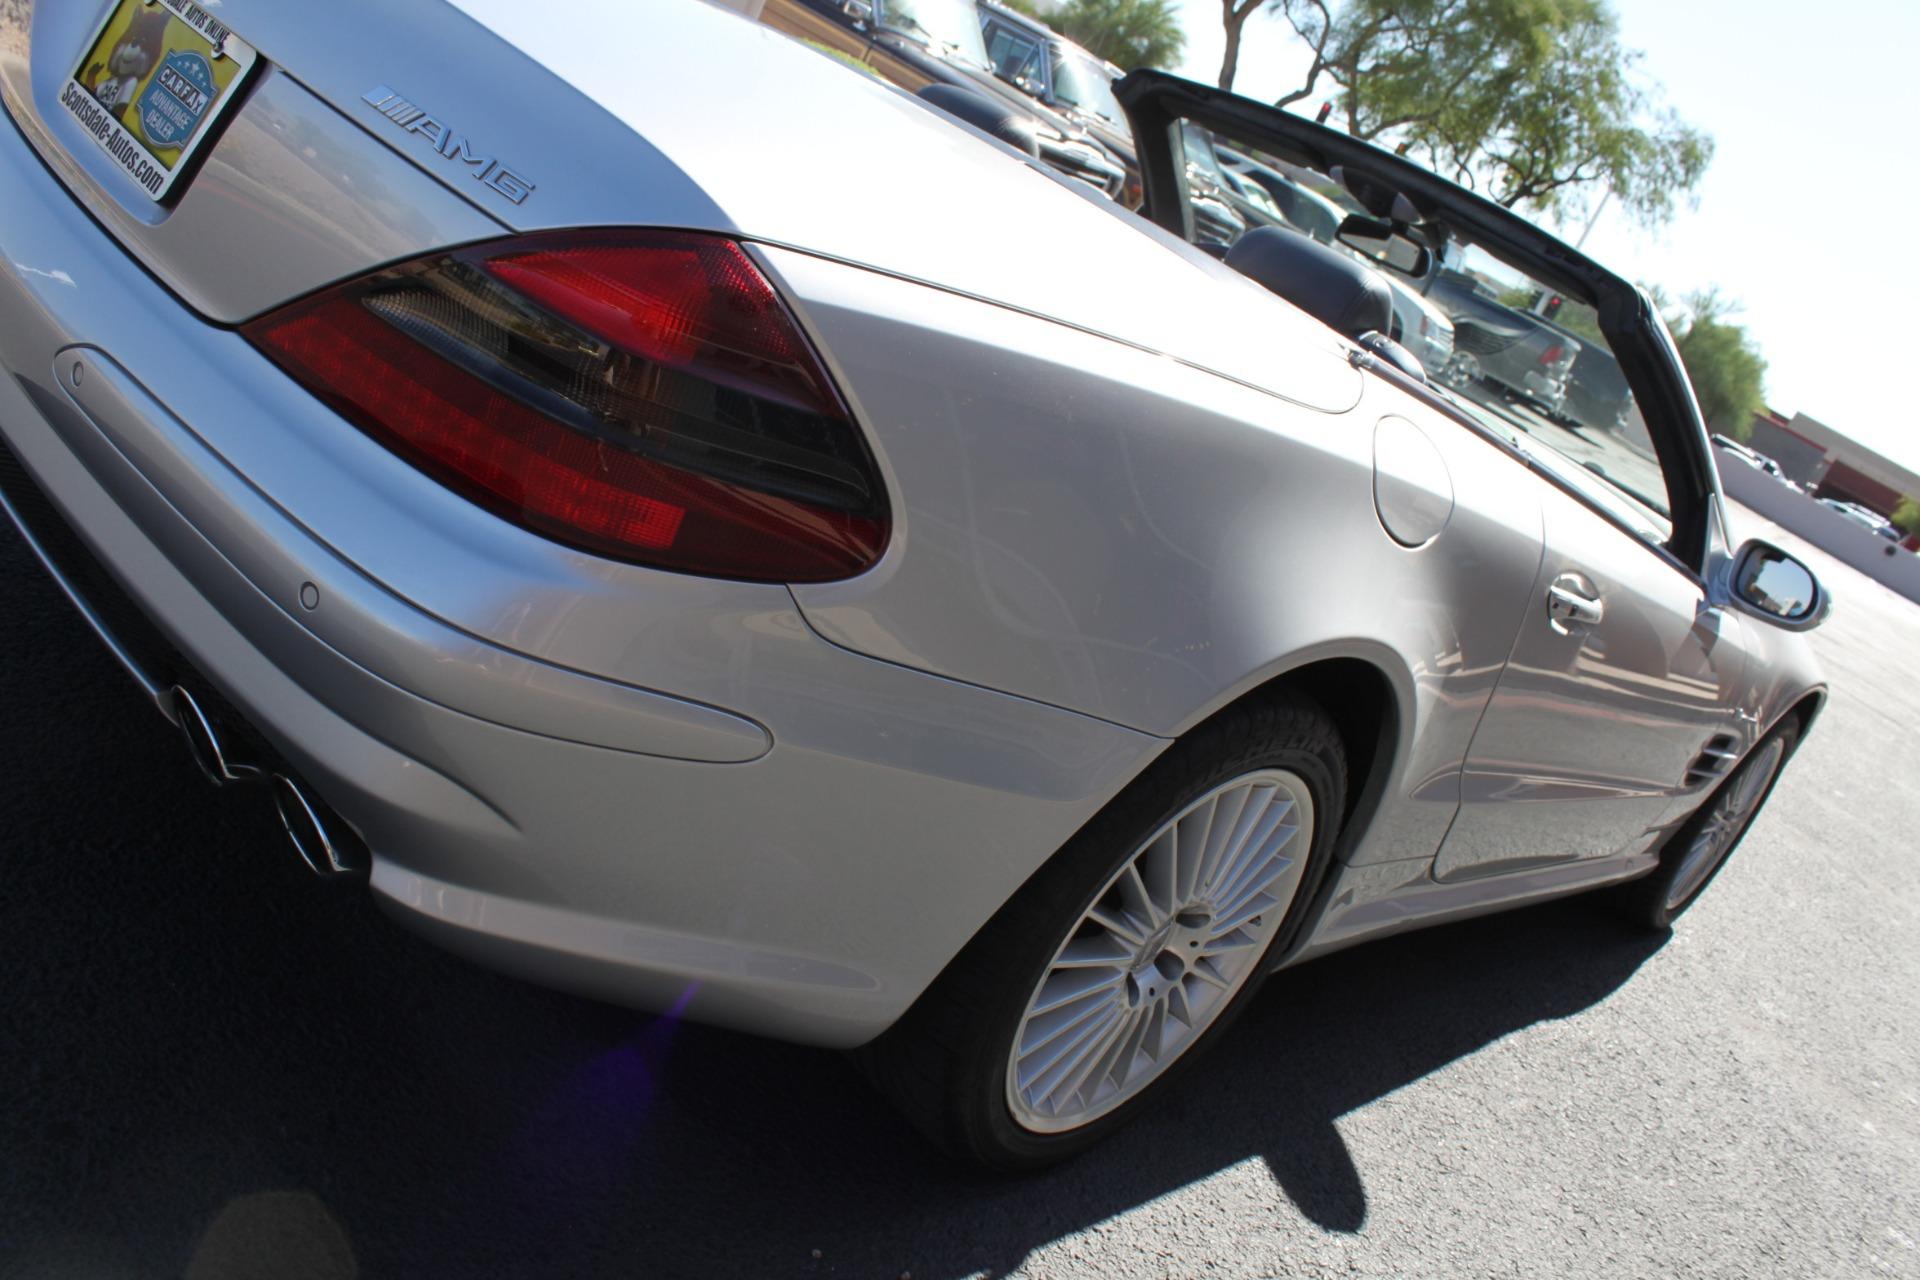 Used-2003-Mercedes-Benz-SL-Class-AMG-Fiat